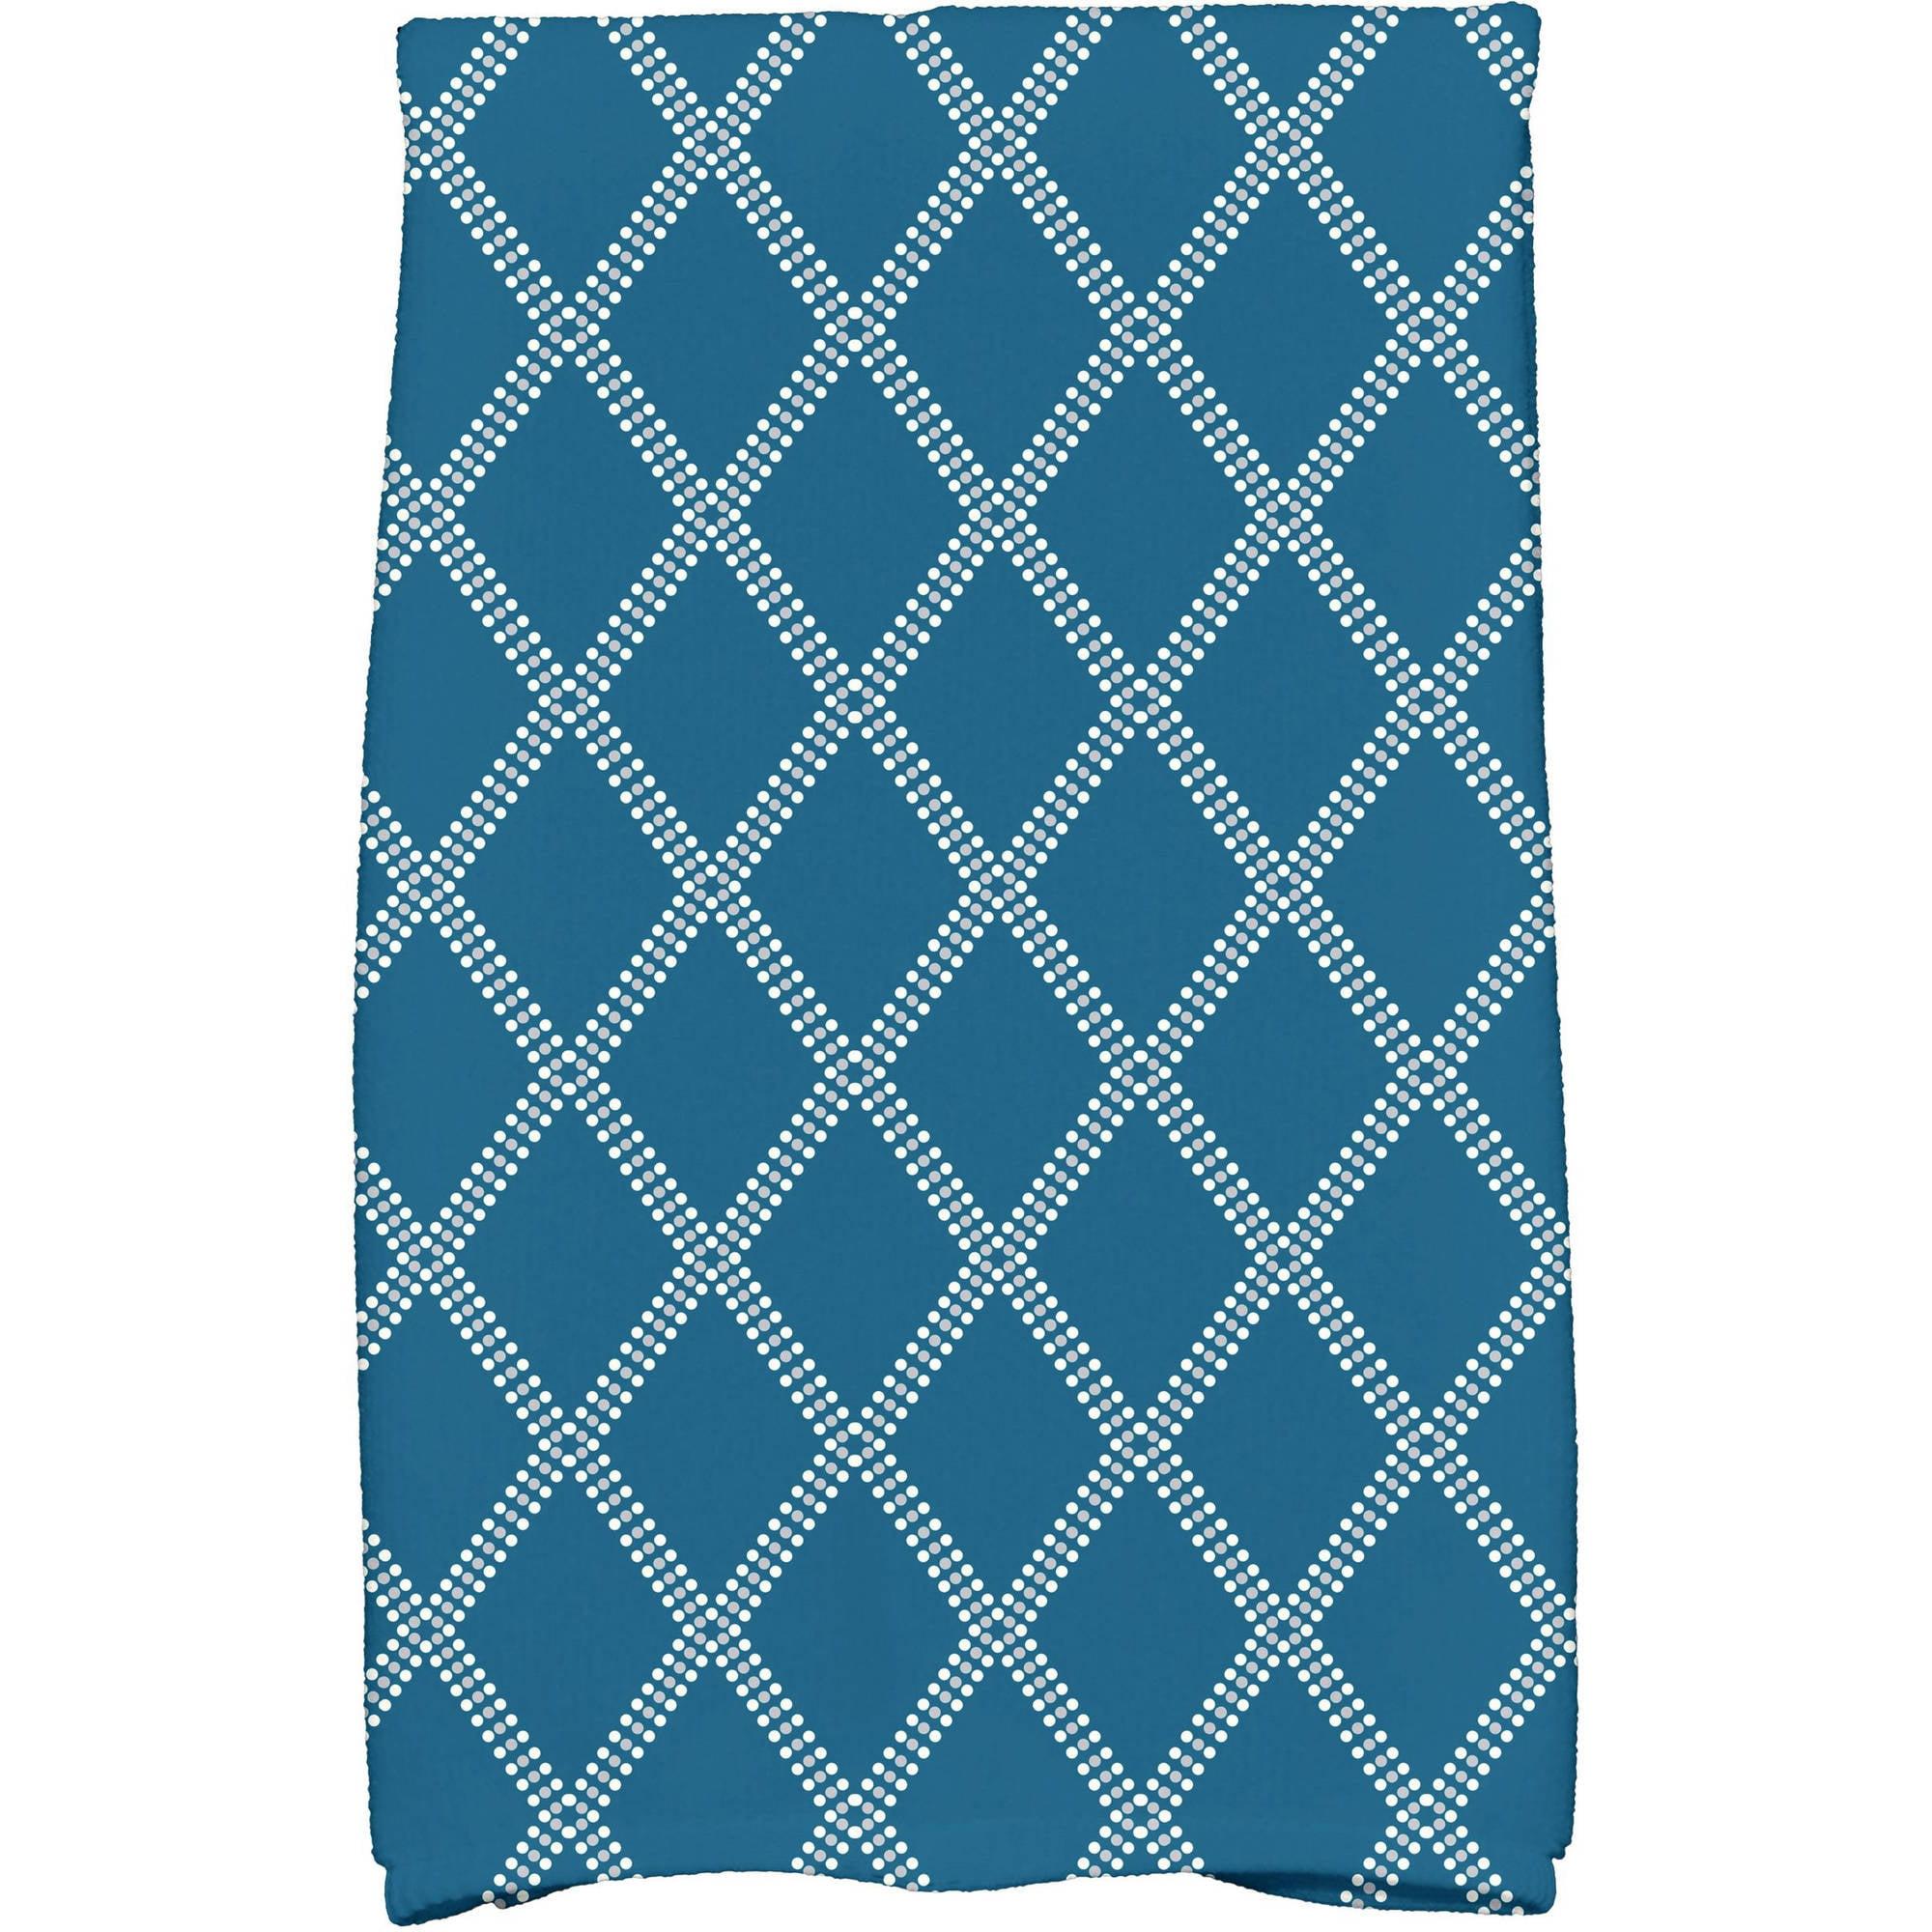 "Simply Daisy 16"" x 25"" Diamond Dots Holiday Geometric Print Kitchen Towel by E By Design"